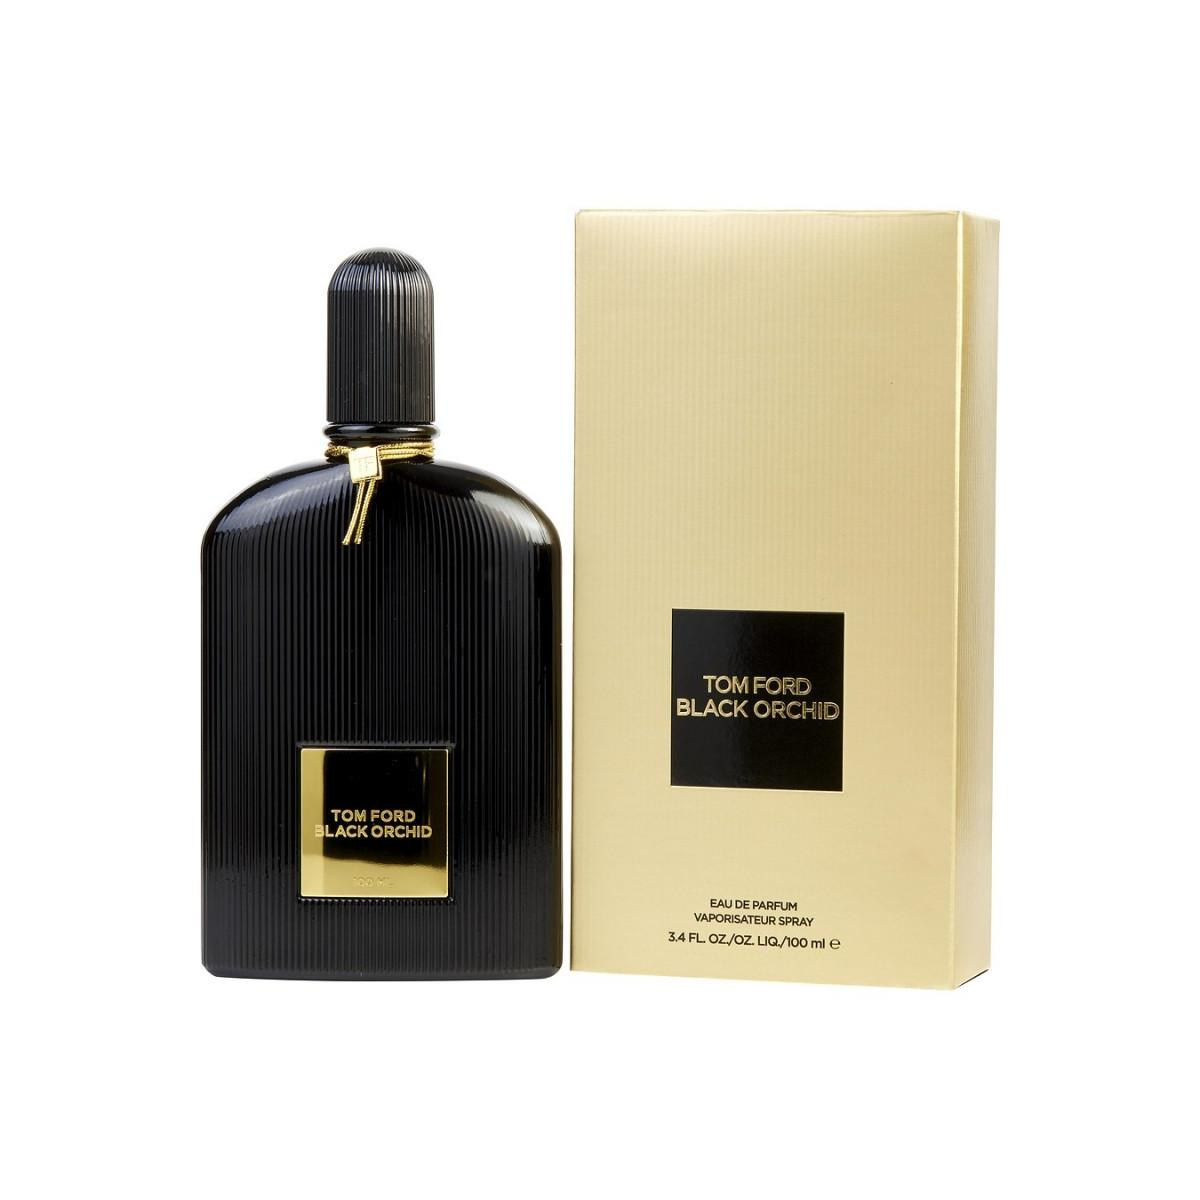 Profumo Tom Ford Black Orchid 100ml Eau de Parfum da uomo